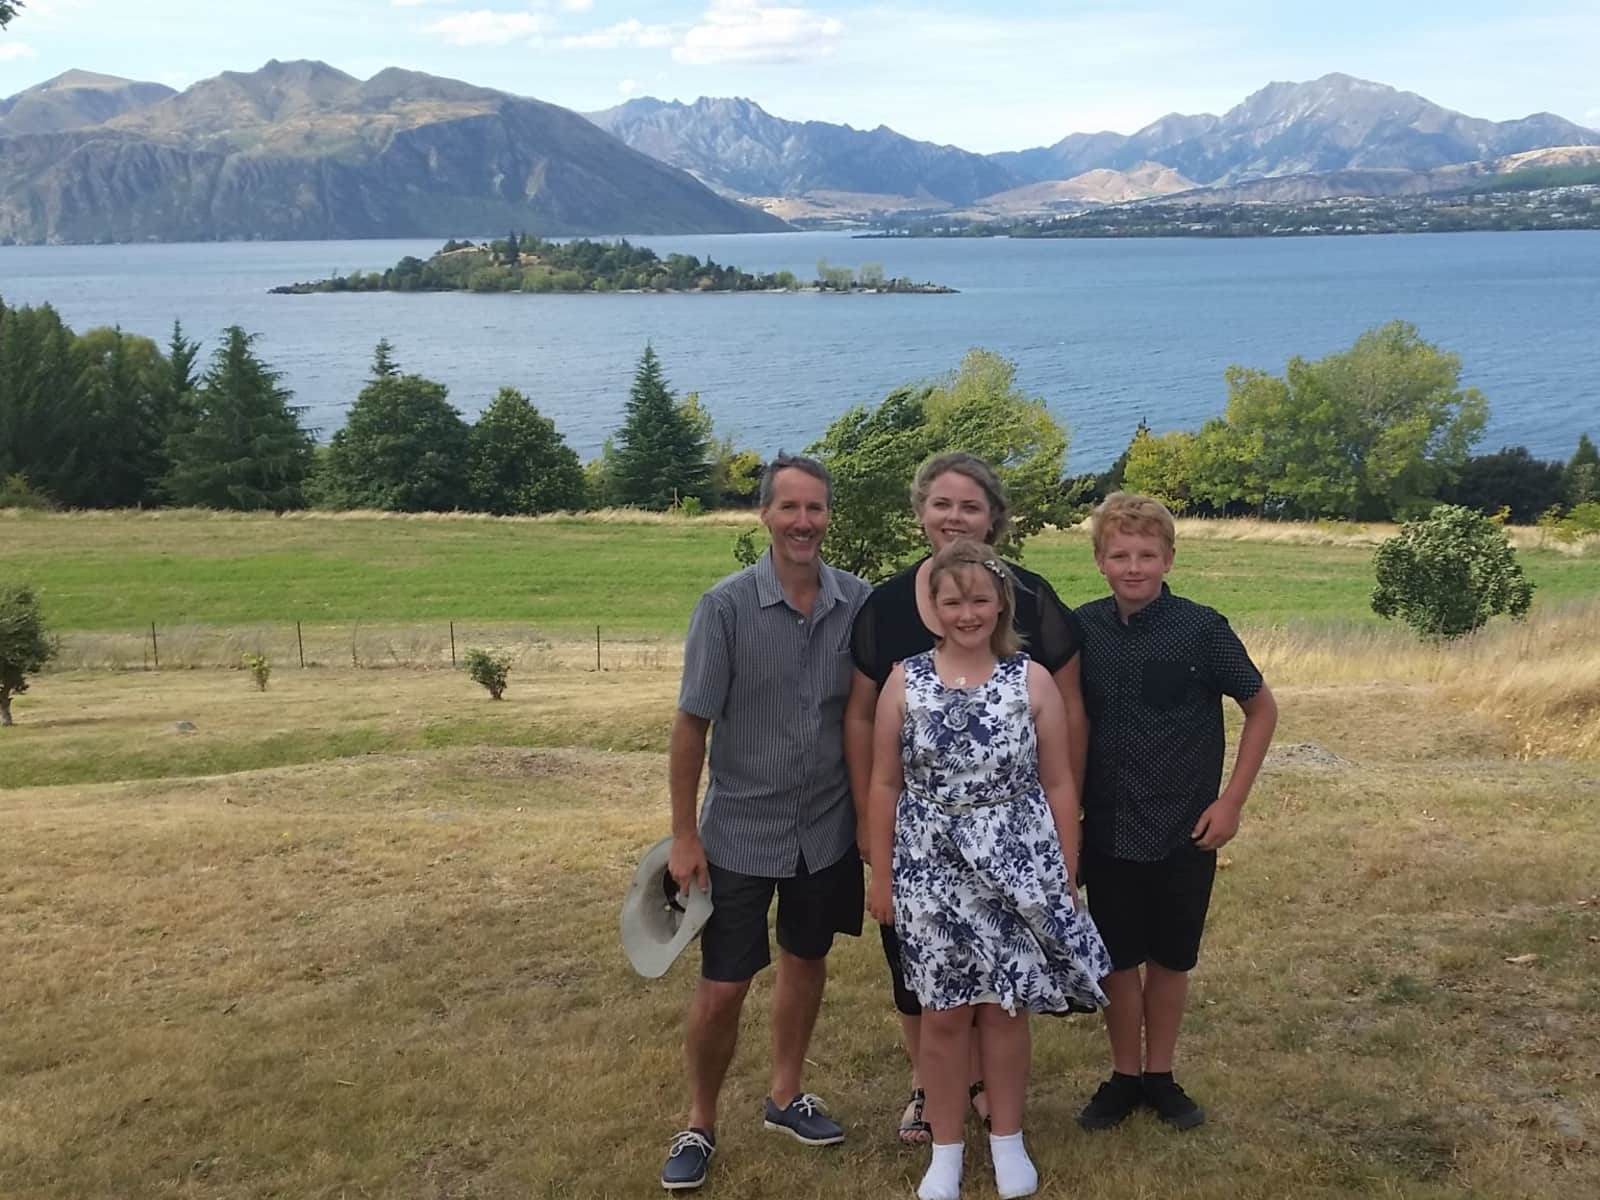 Leanne & Derek from Hamilton, New Zealand